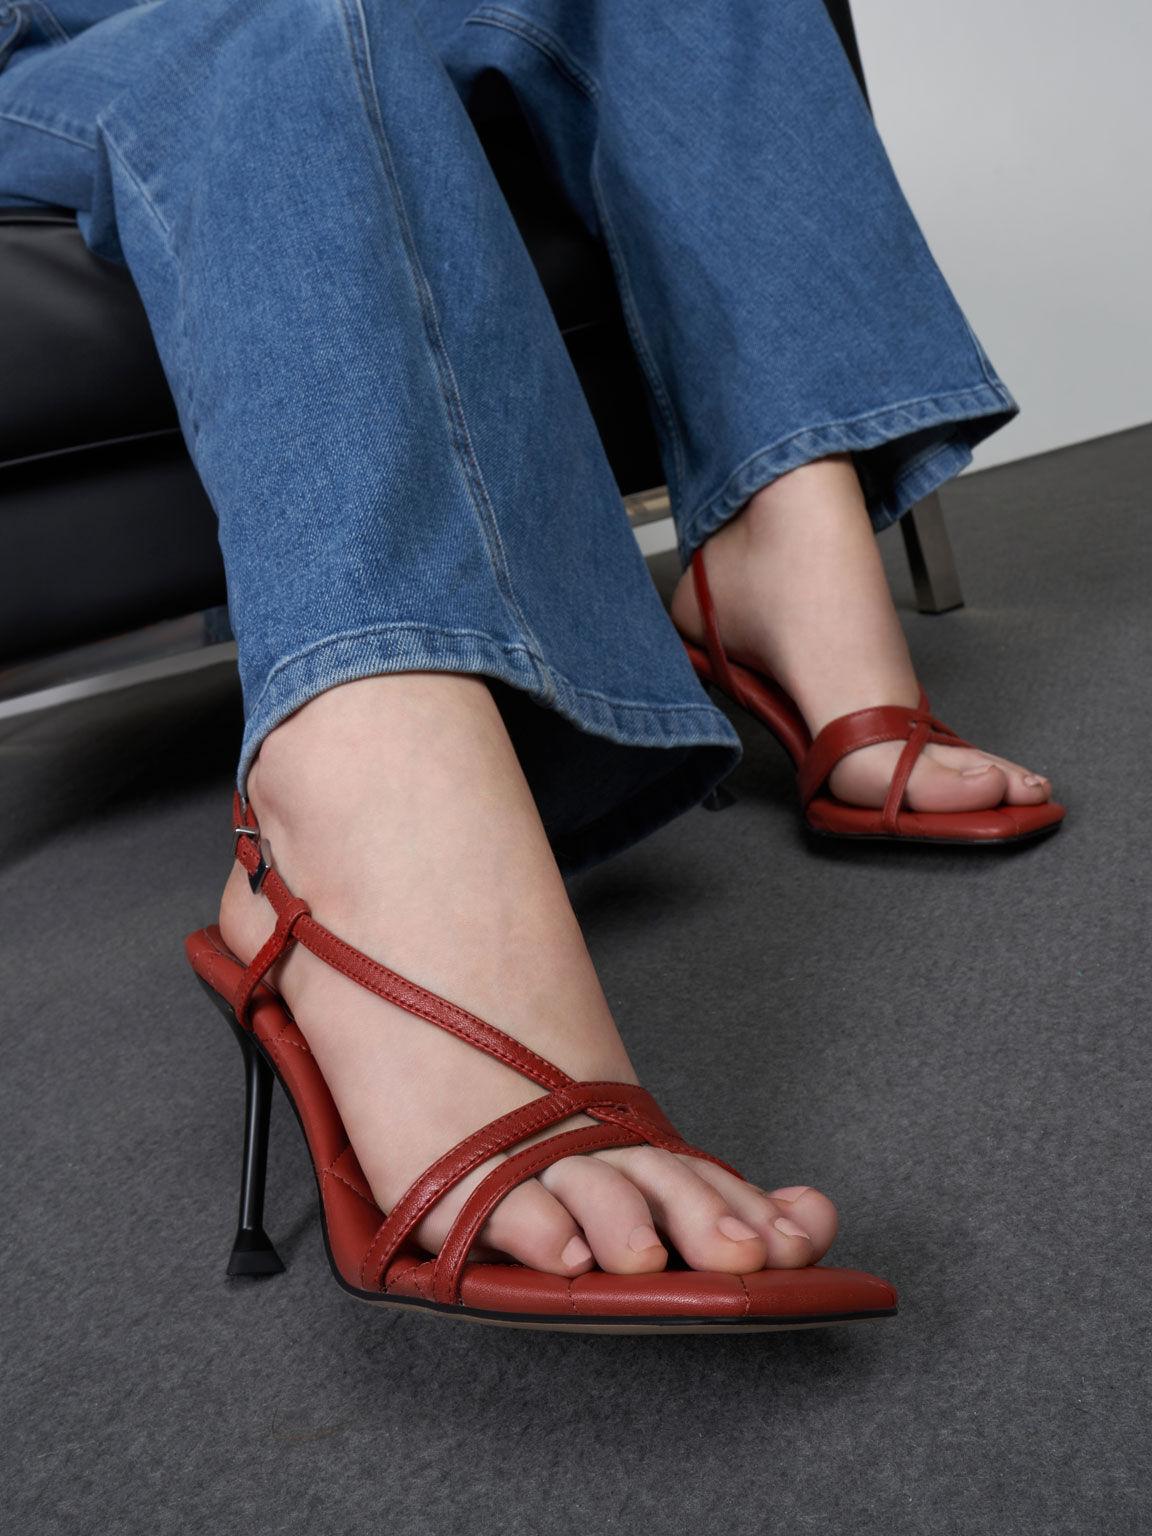 Leather Sculptural Heel Sandals, Brick, hi-res